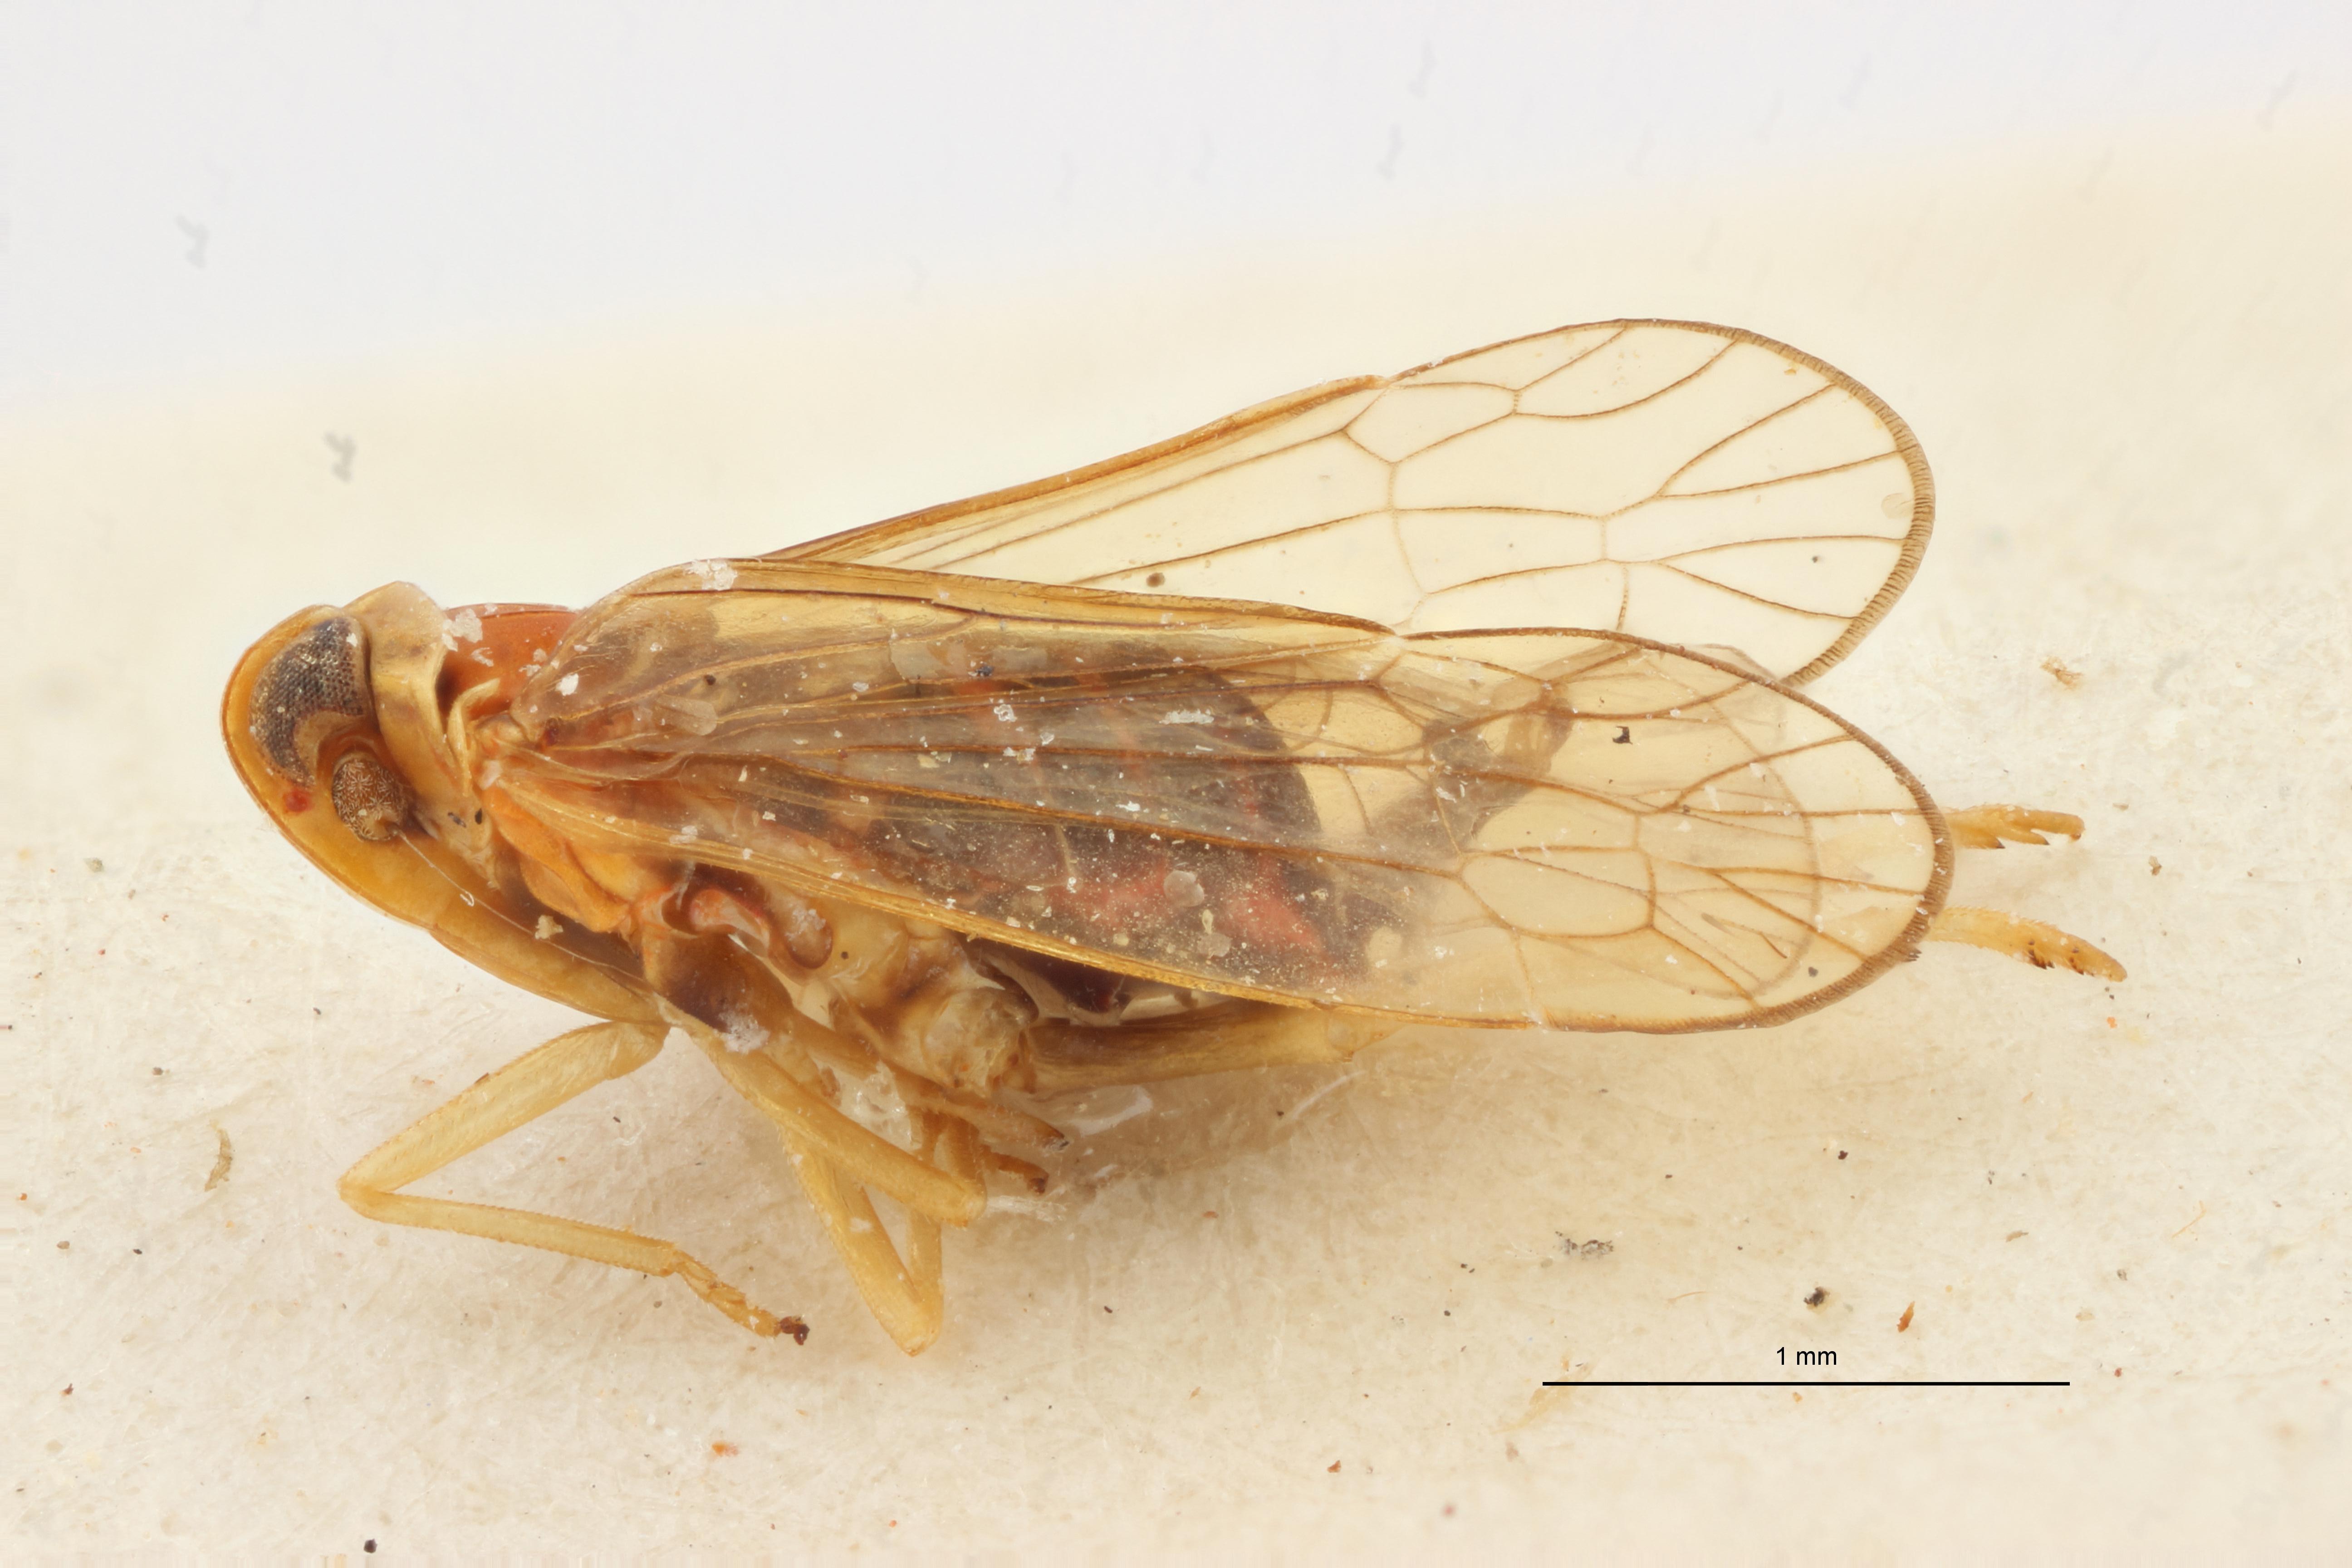 Paramicrixia insularis pt1 L ZS PMax Scaled.jpeg